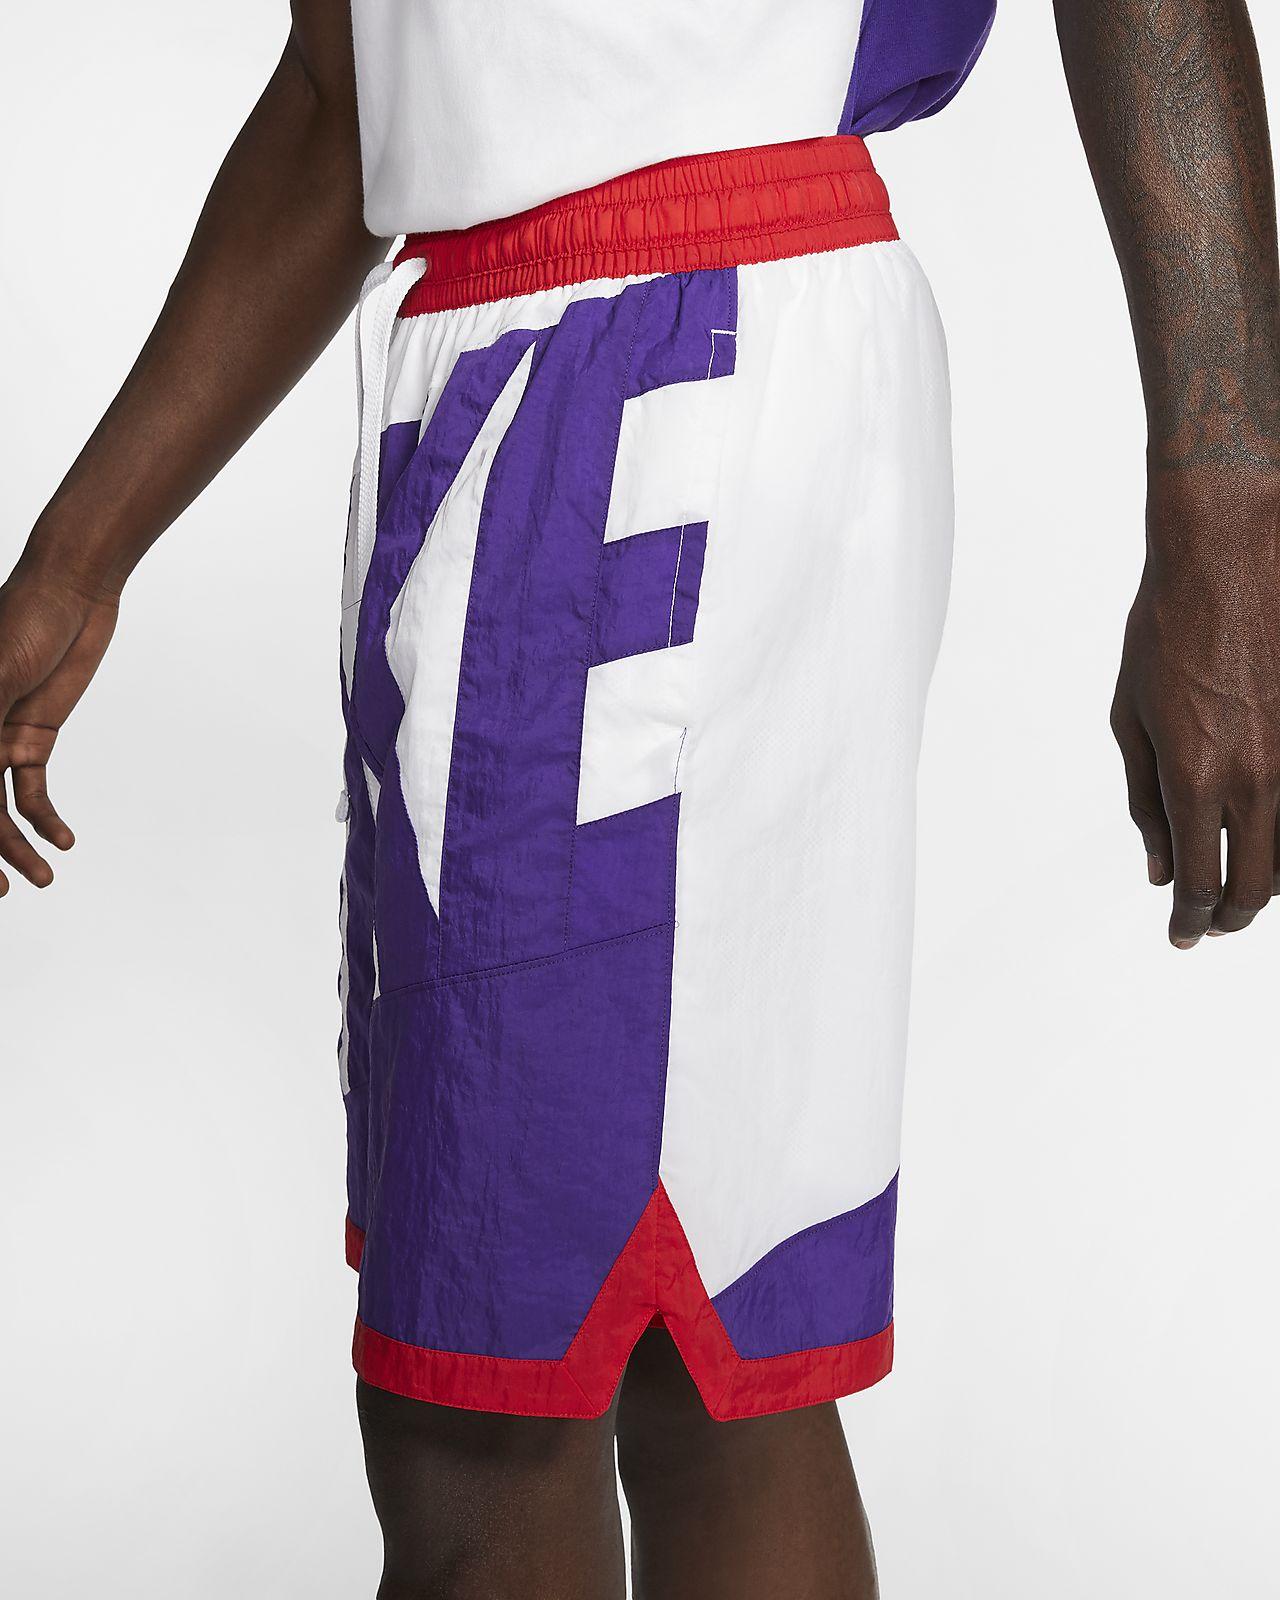 Nike Swingman Size Guide – Throwback